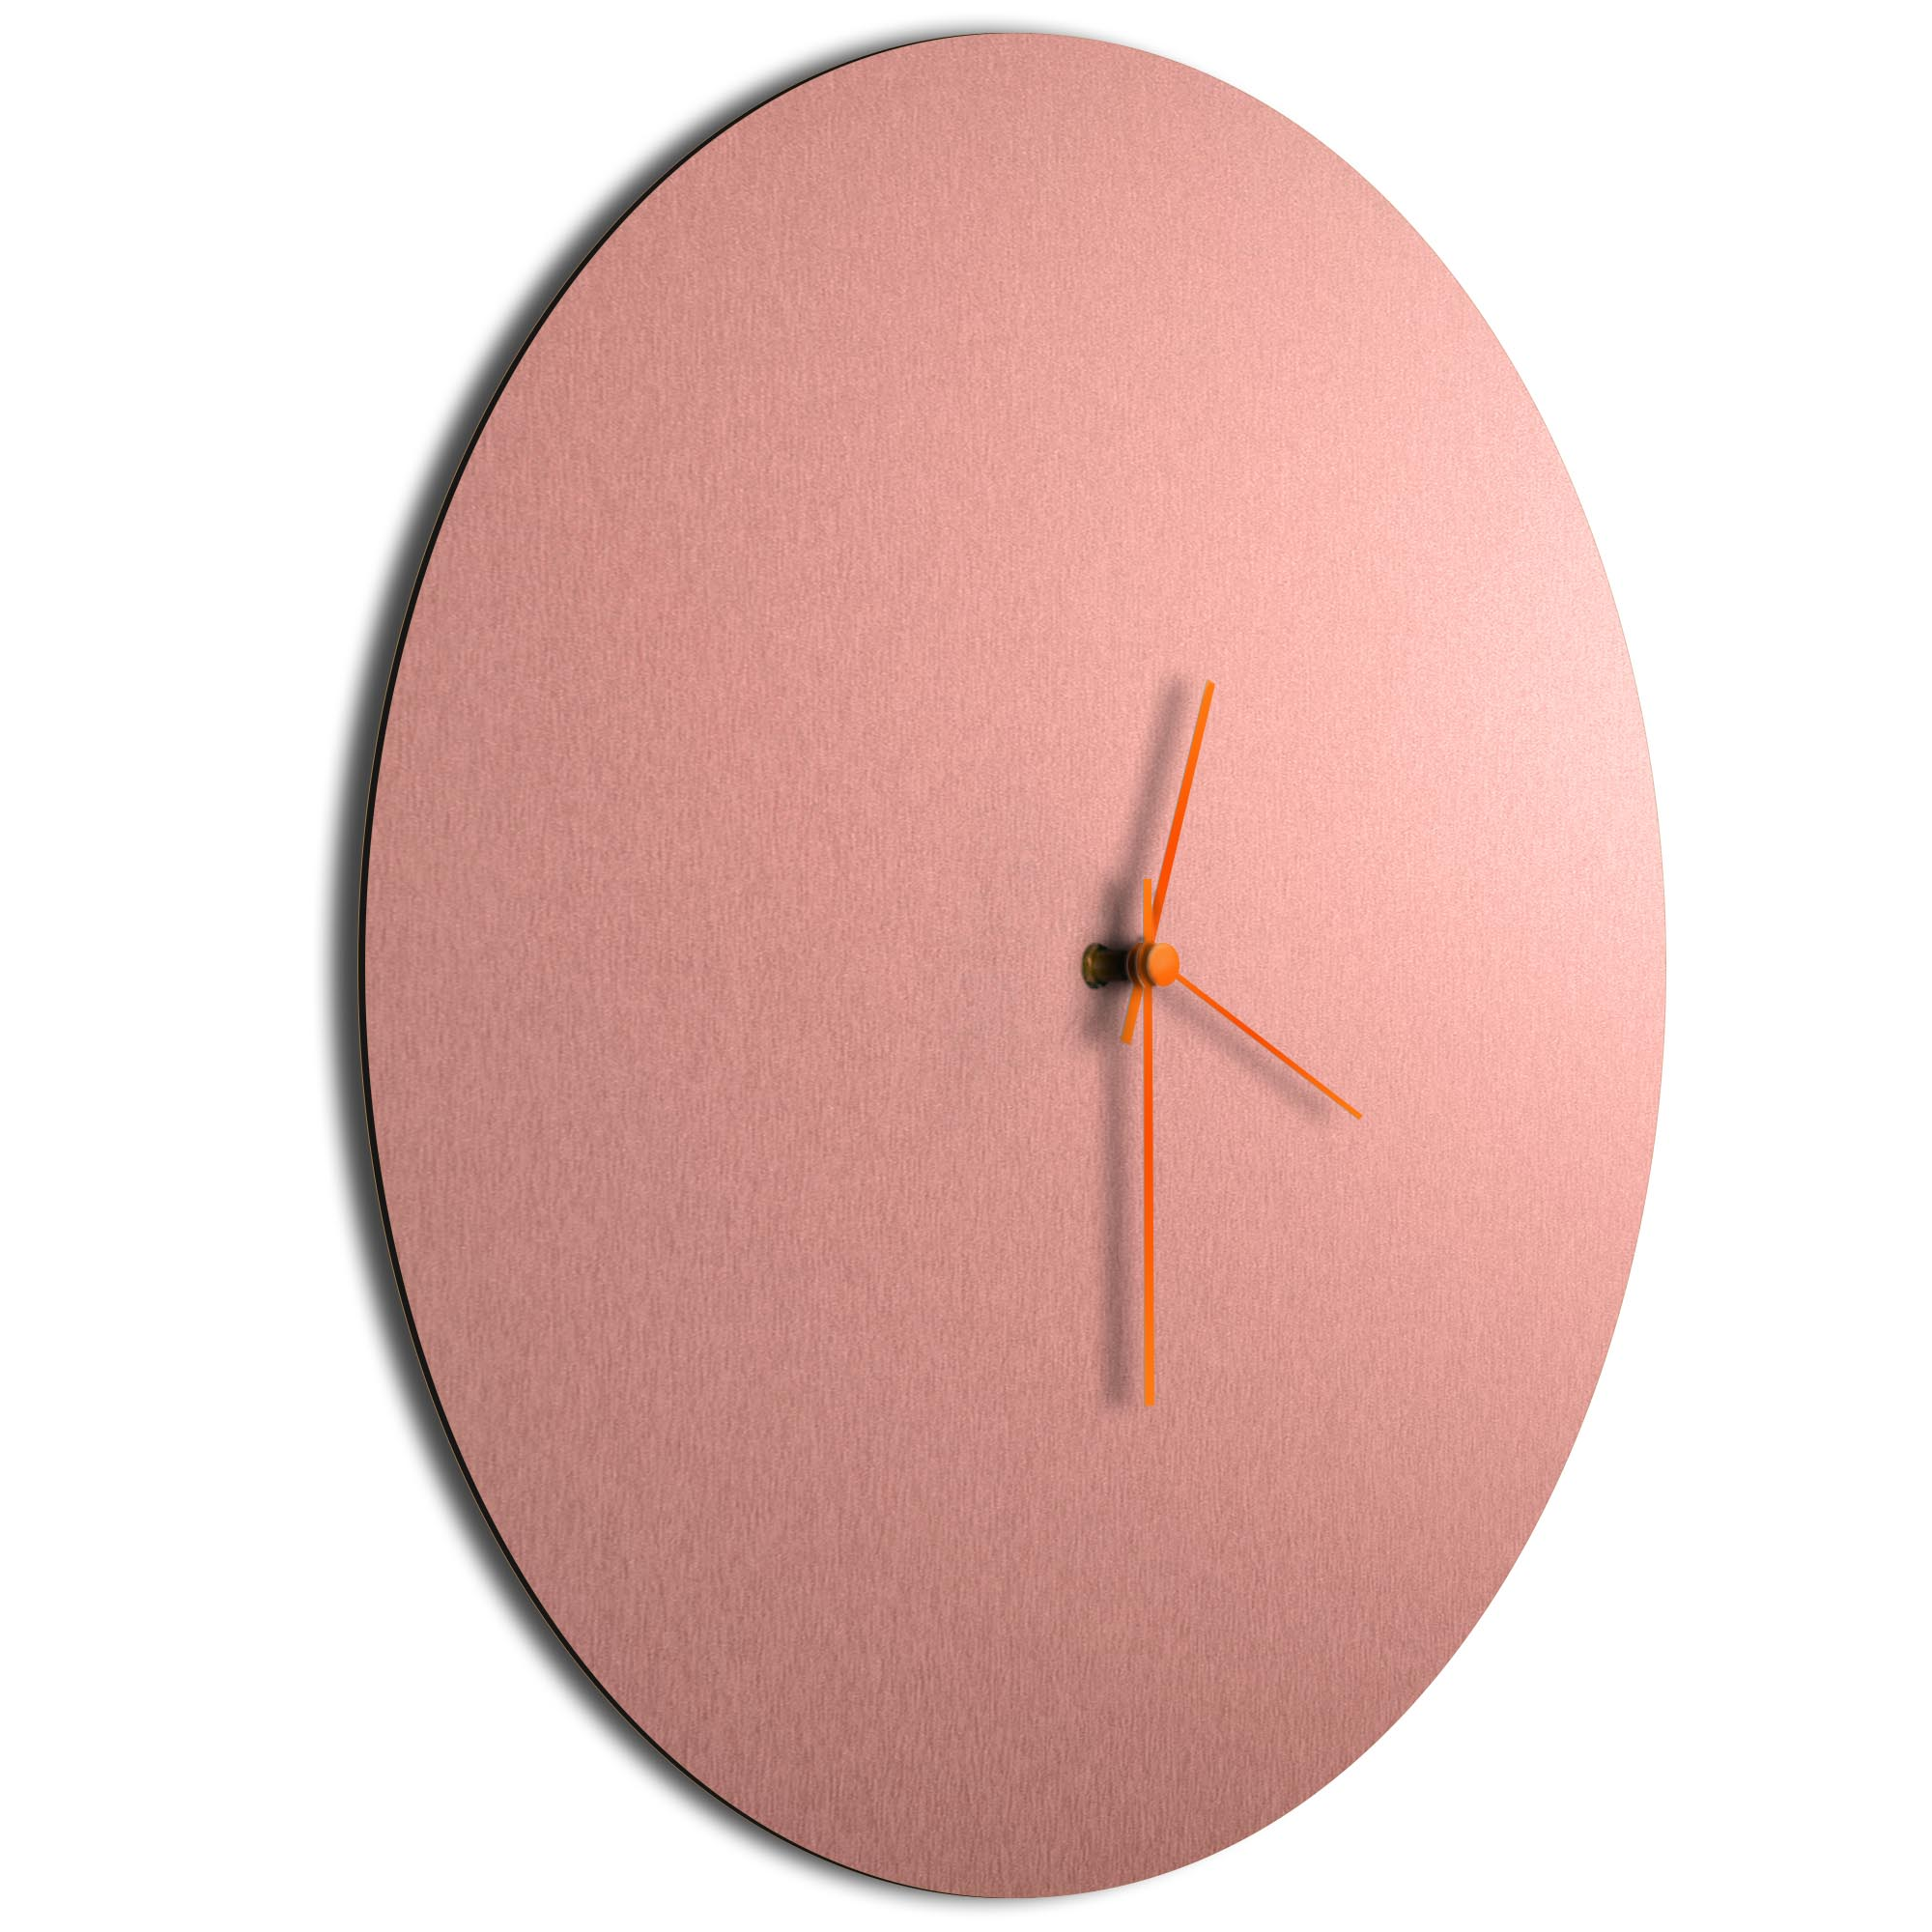 Coppersmith Circle Clock Orange - Image 2